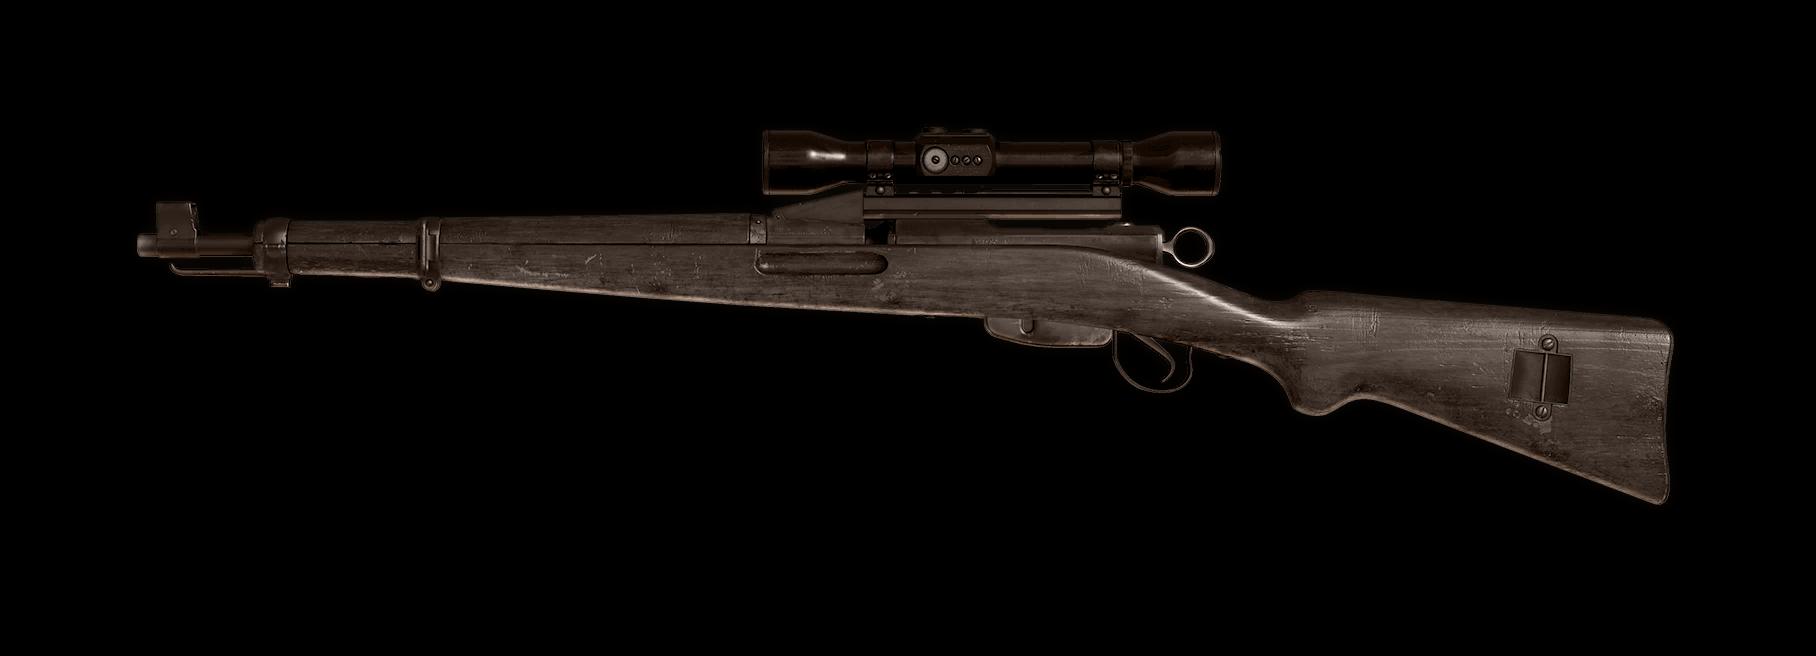 Image of Swiss K31